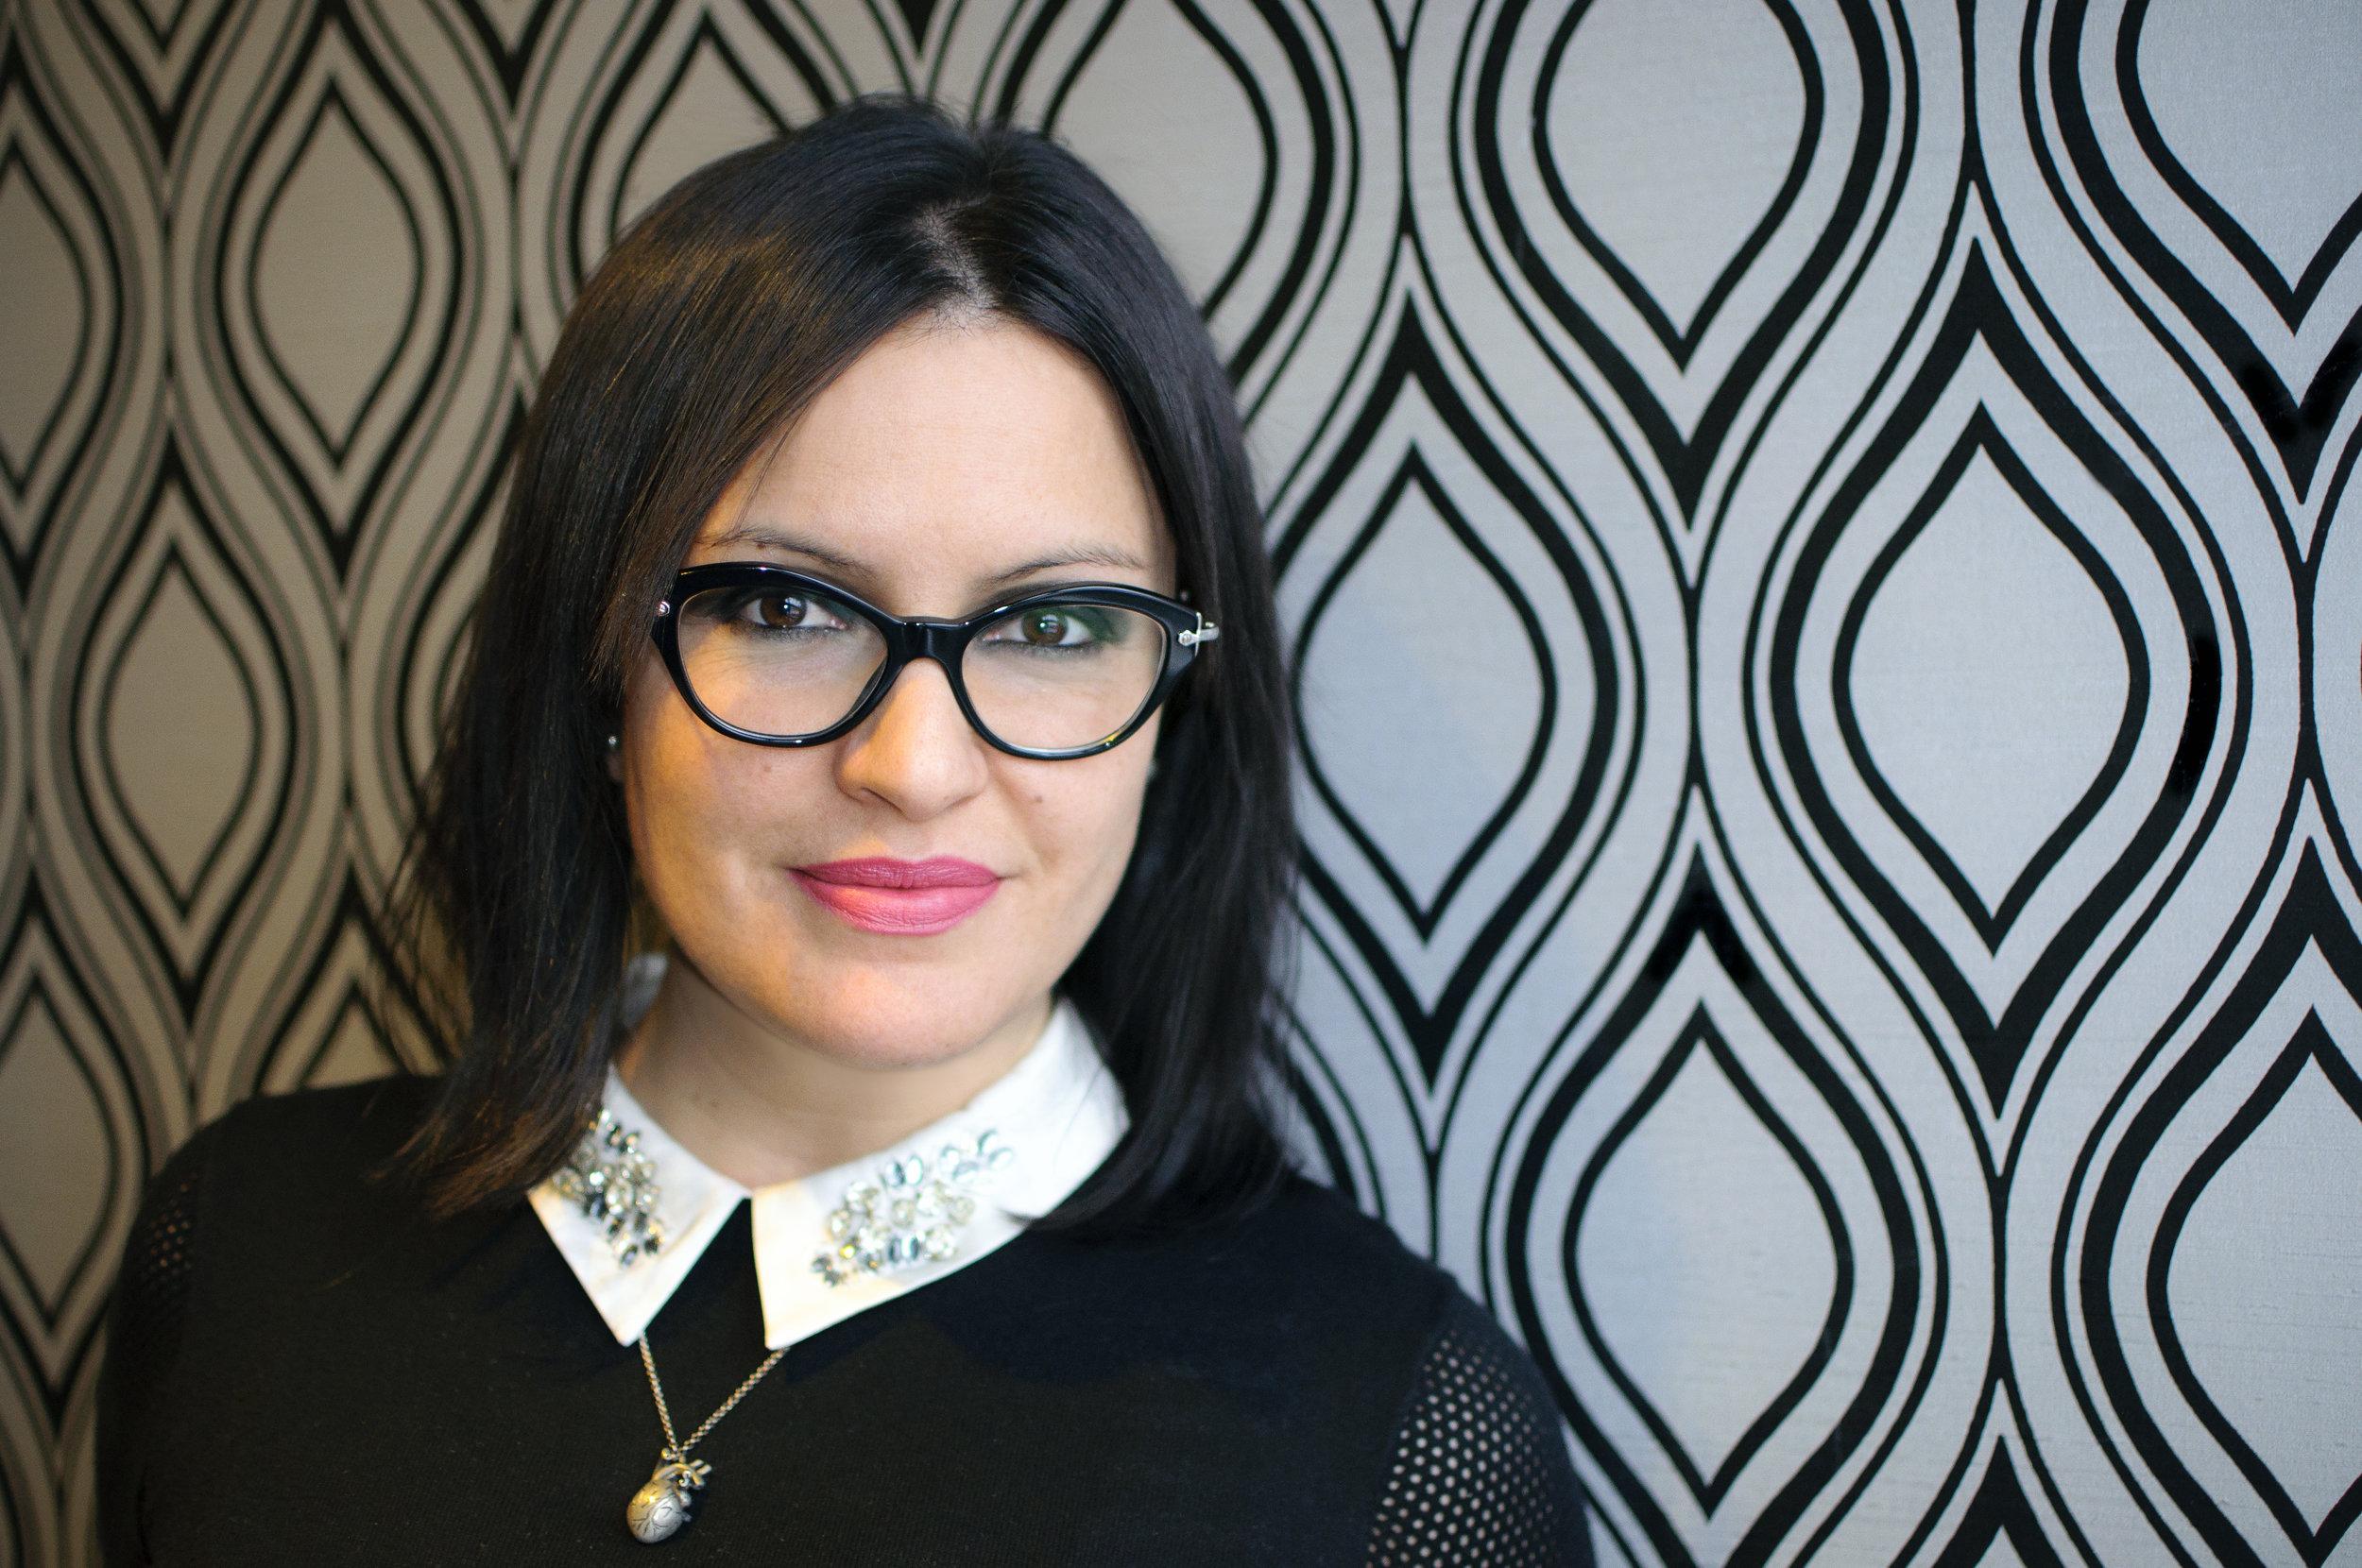 Mi glándula tiroides, testimonio - Revista Bienestar (Español)